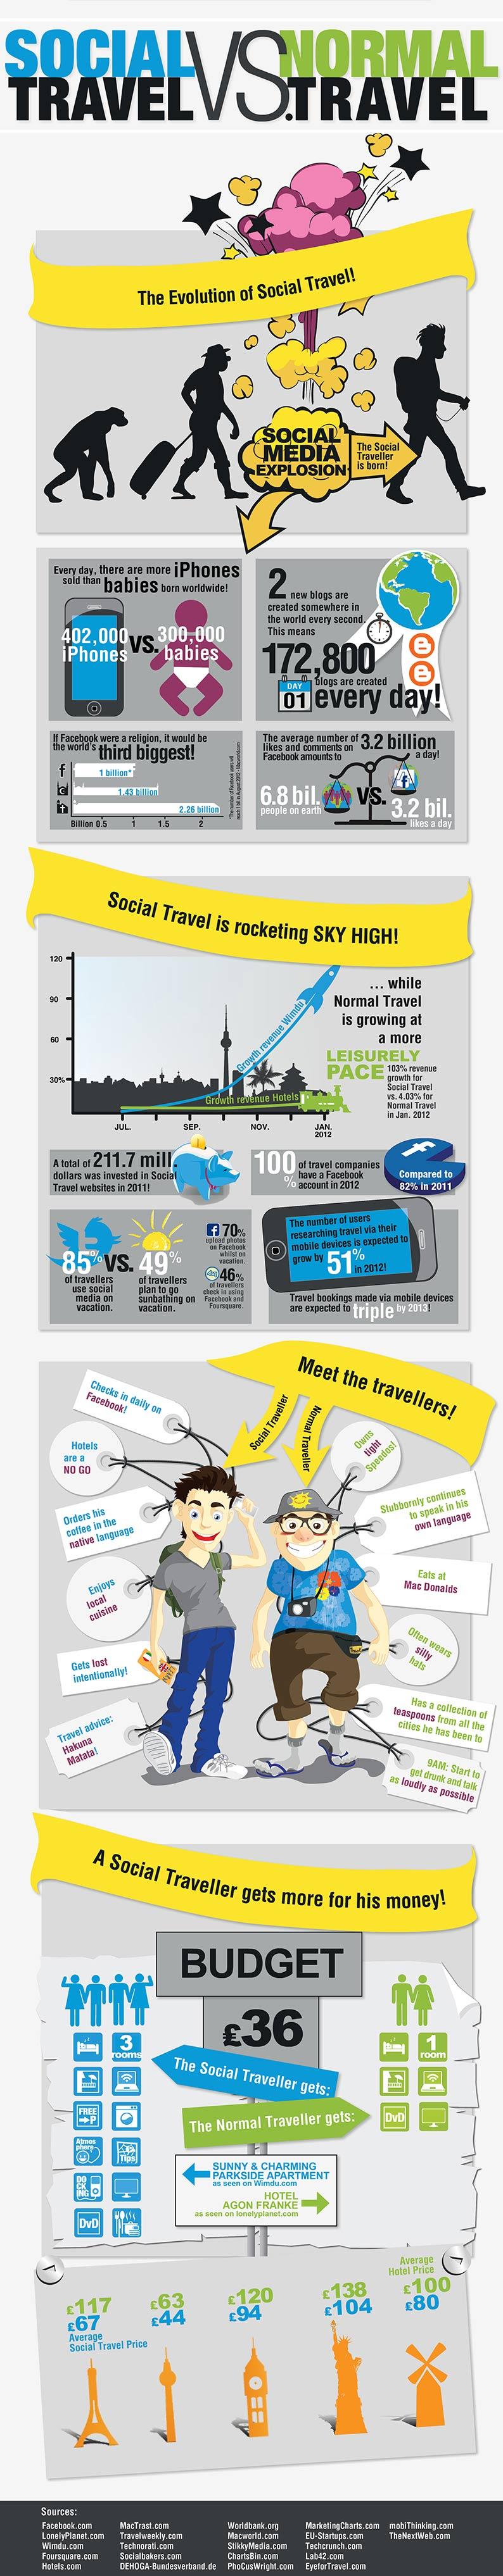 Social-Travel-Vs-Normal-Travel-infographic